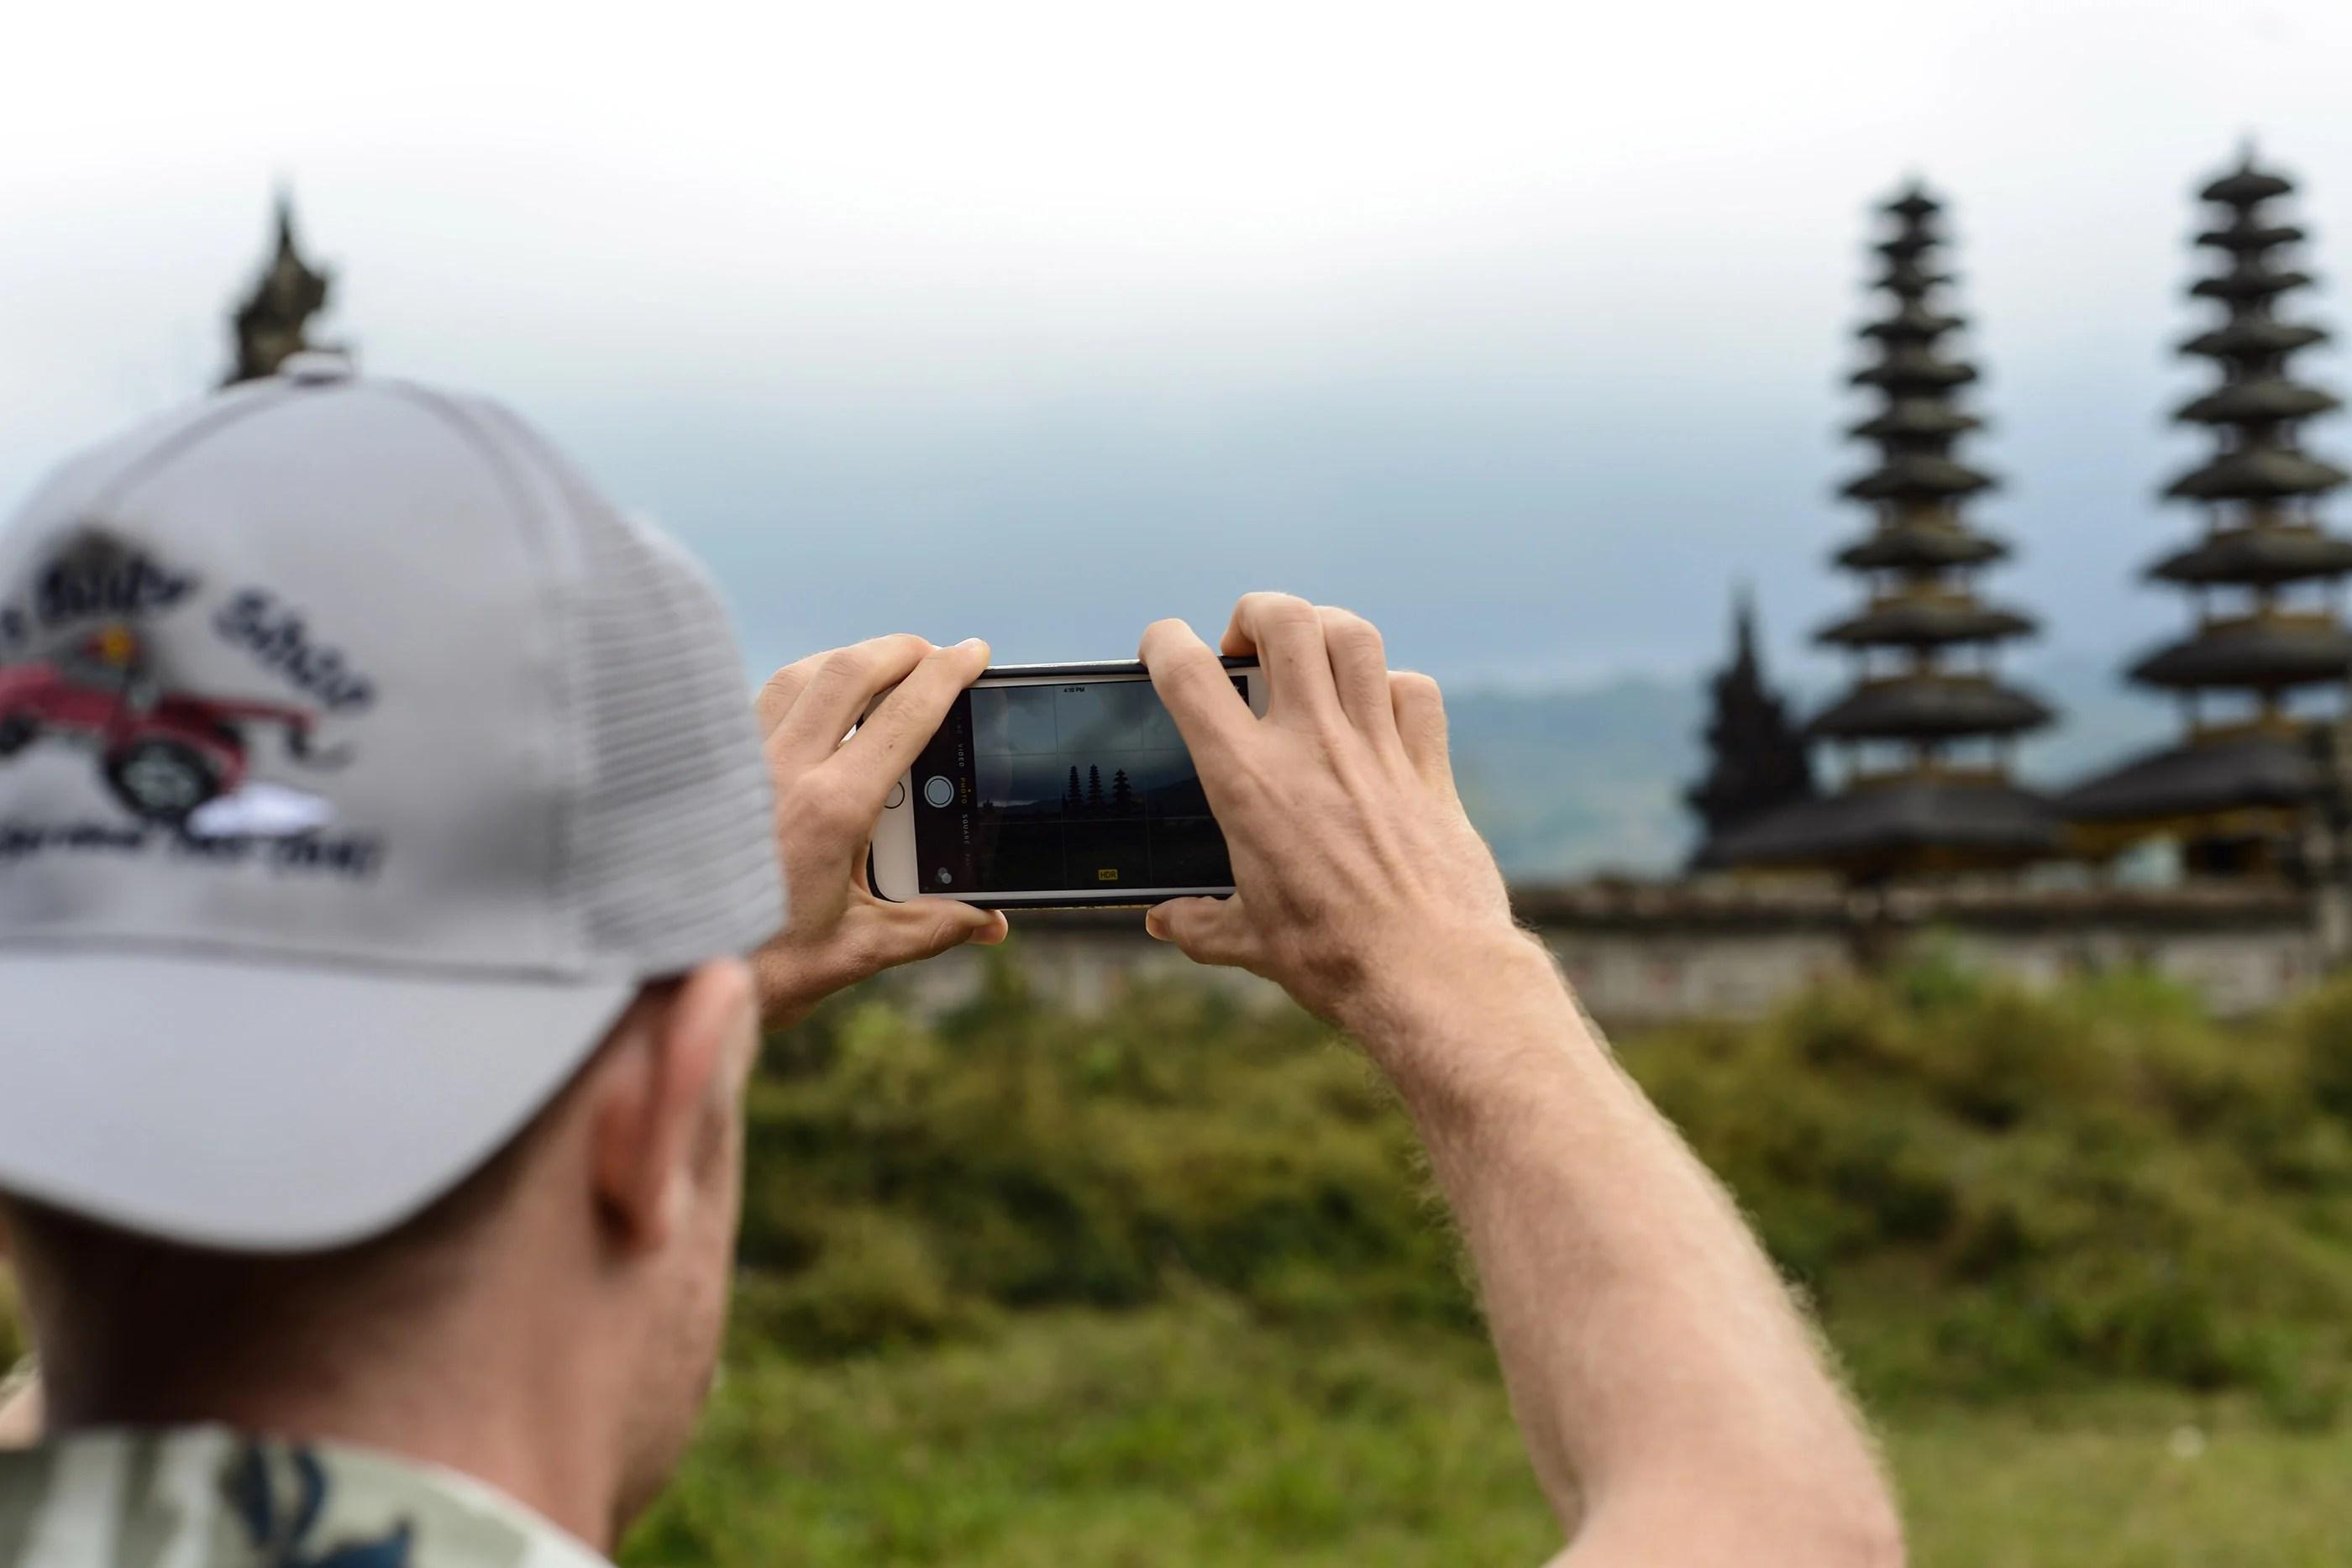 iphone-camera-cameraphone-photo-photography-framing-bali-indonesia